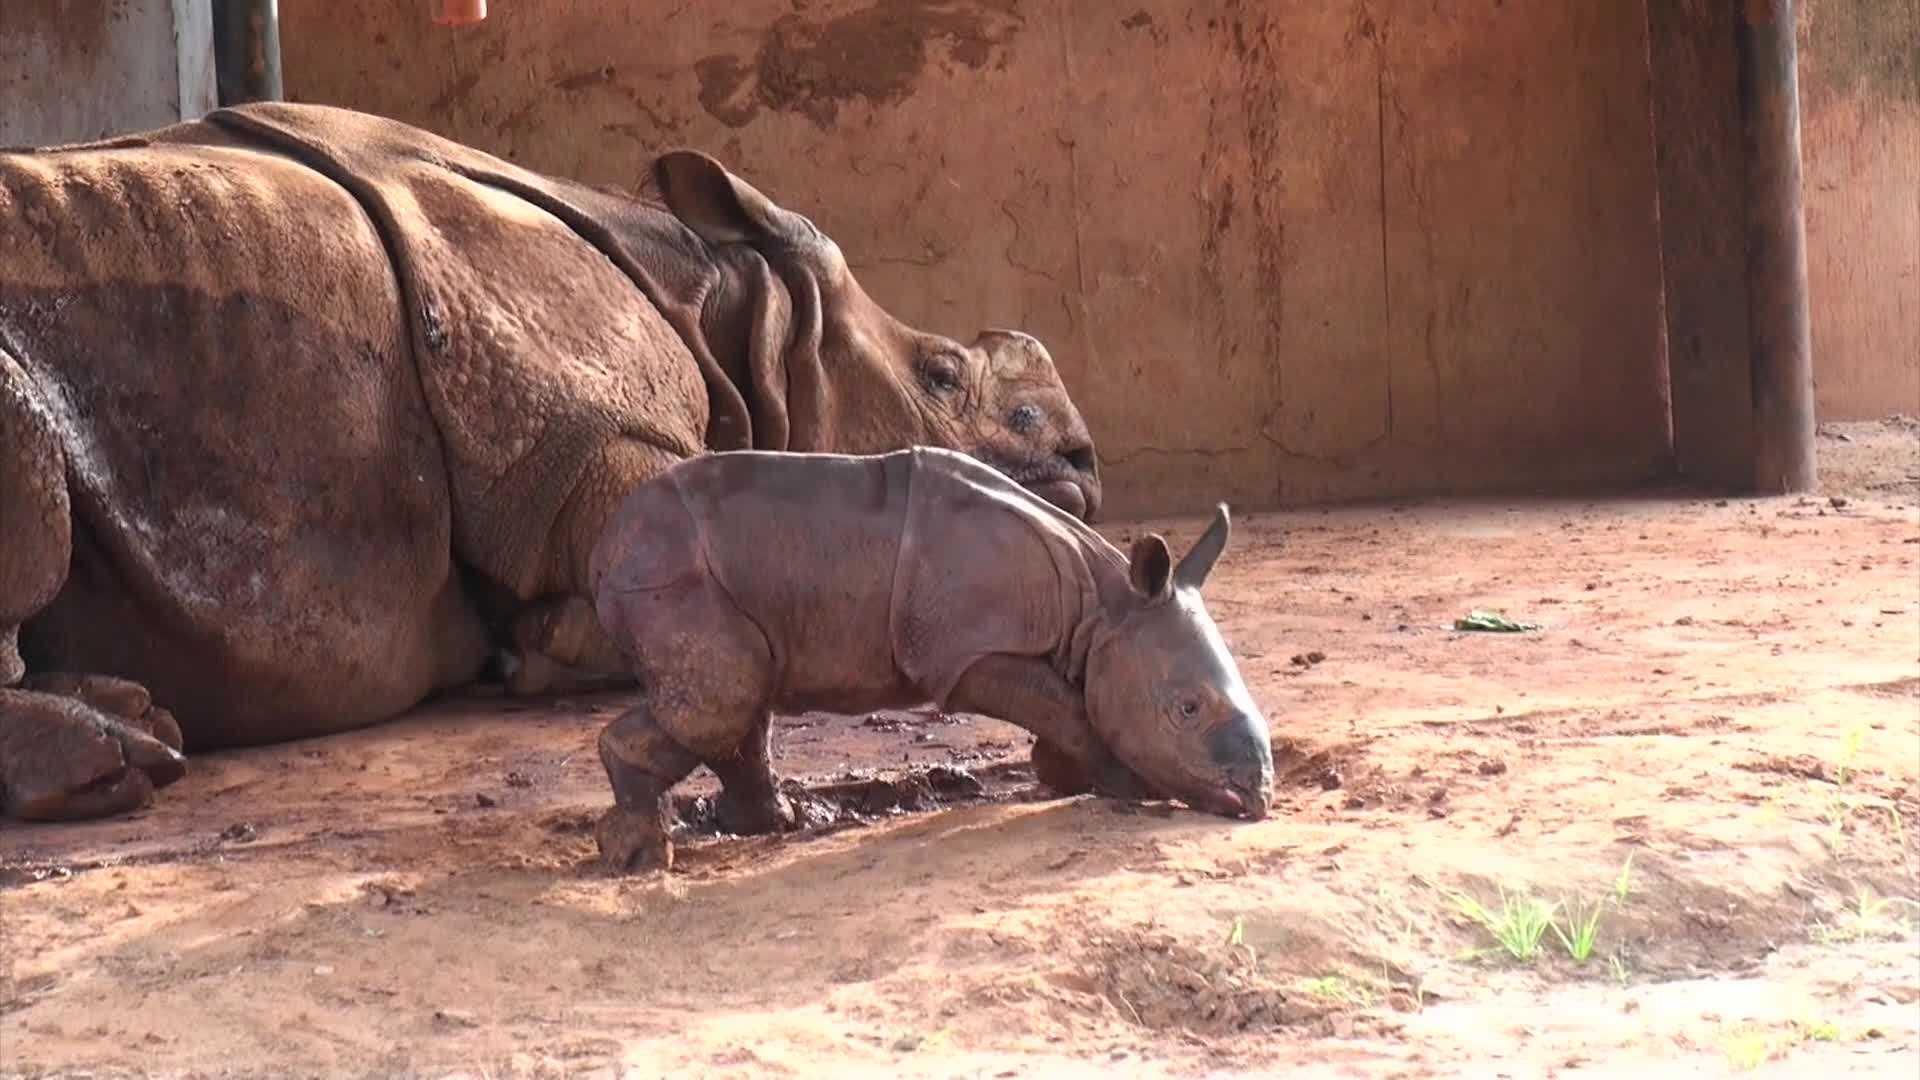 The Oklahoma City Zoo has welcomed a baby rhino.